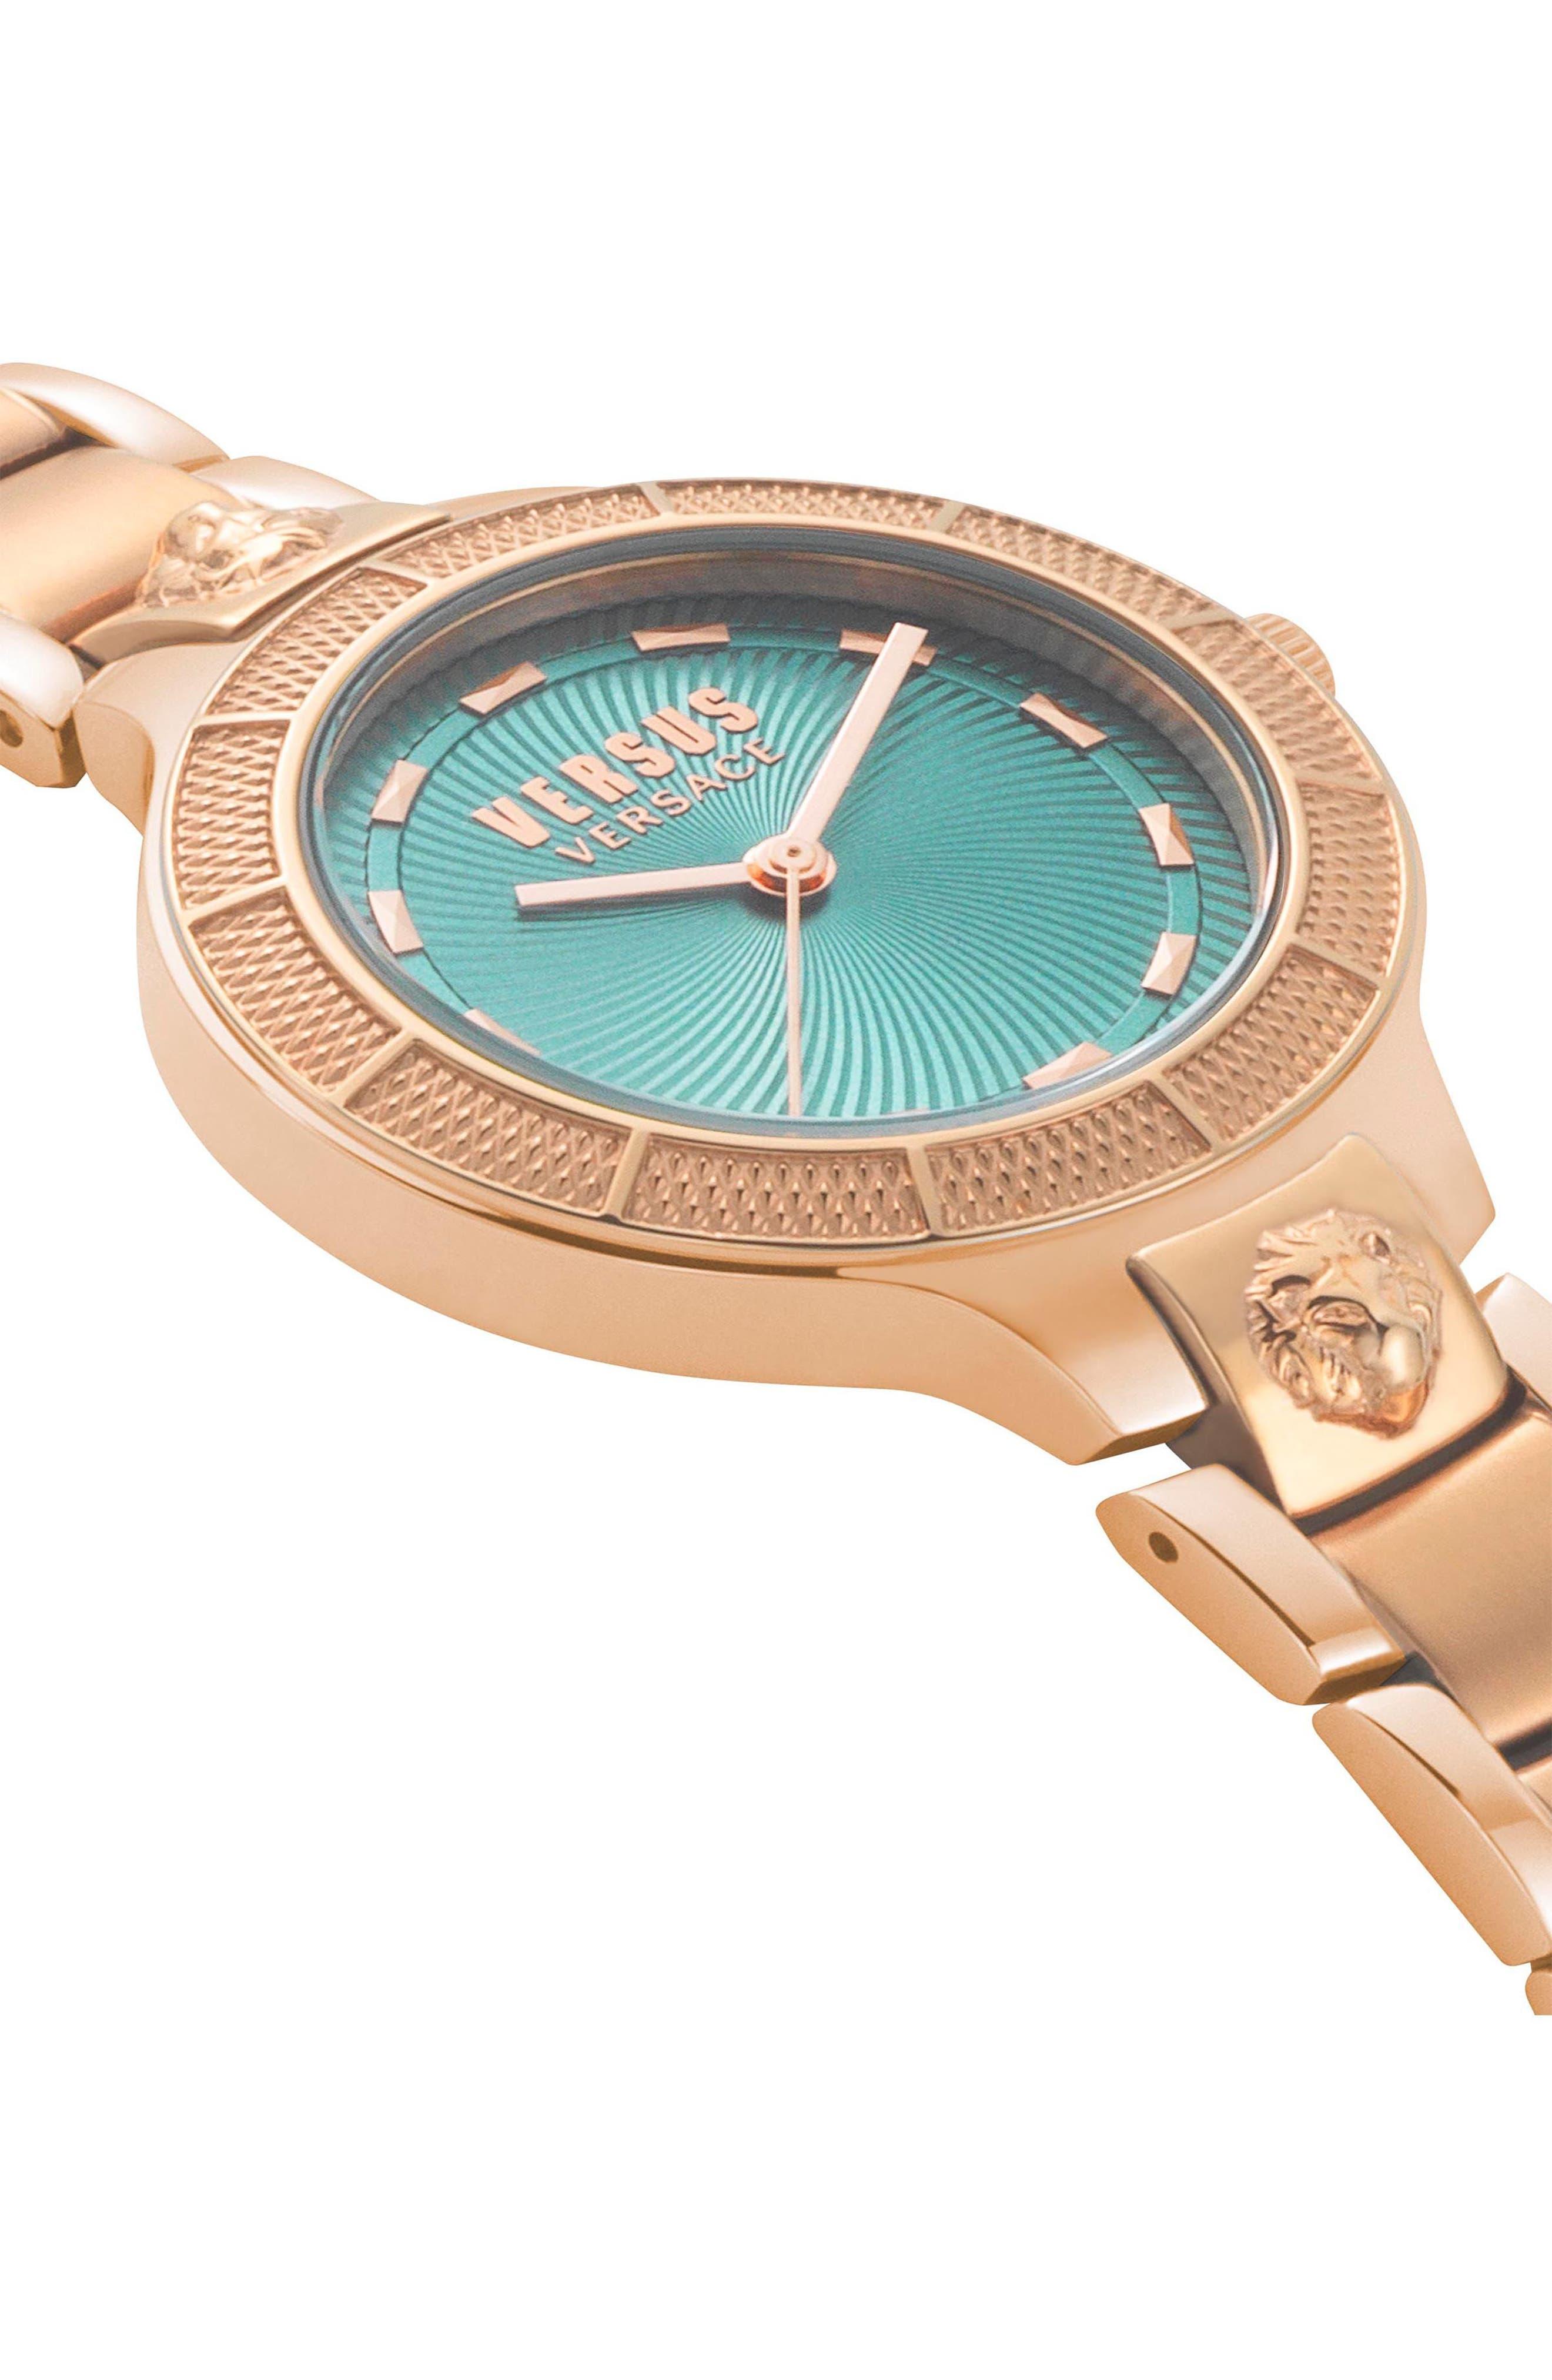 VERSUS by Versace Claremont Bracelet Watch, 32mm,                             Alternate thumbnail 3, color,                             Rose Gold/ Green/ Rose Gold